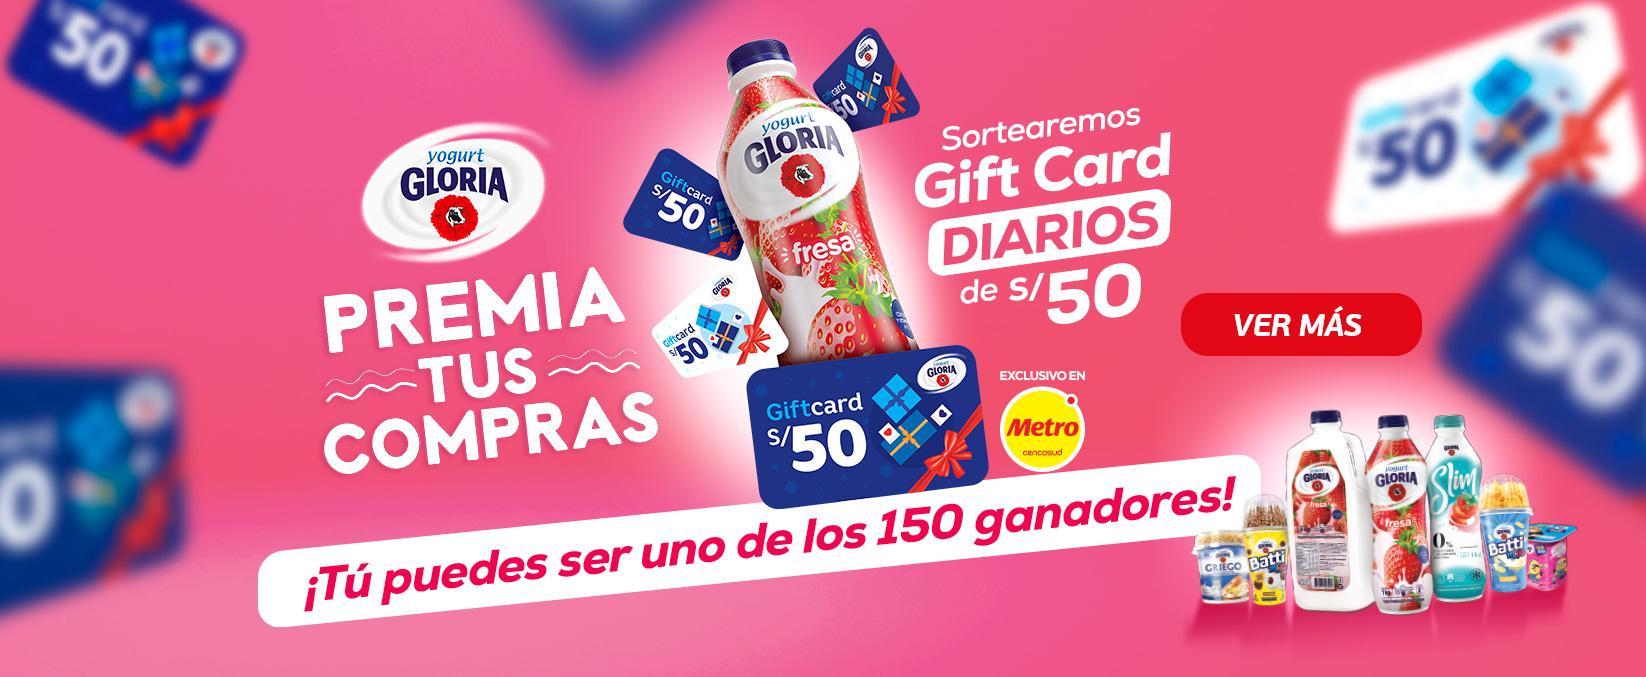 Yogurt Gloria premia tus compras